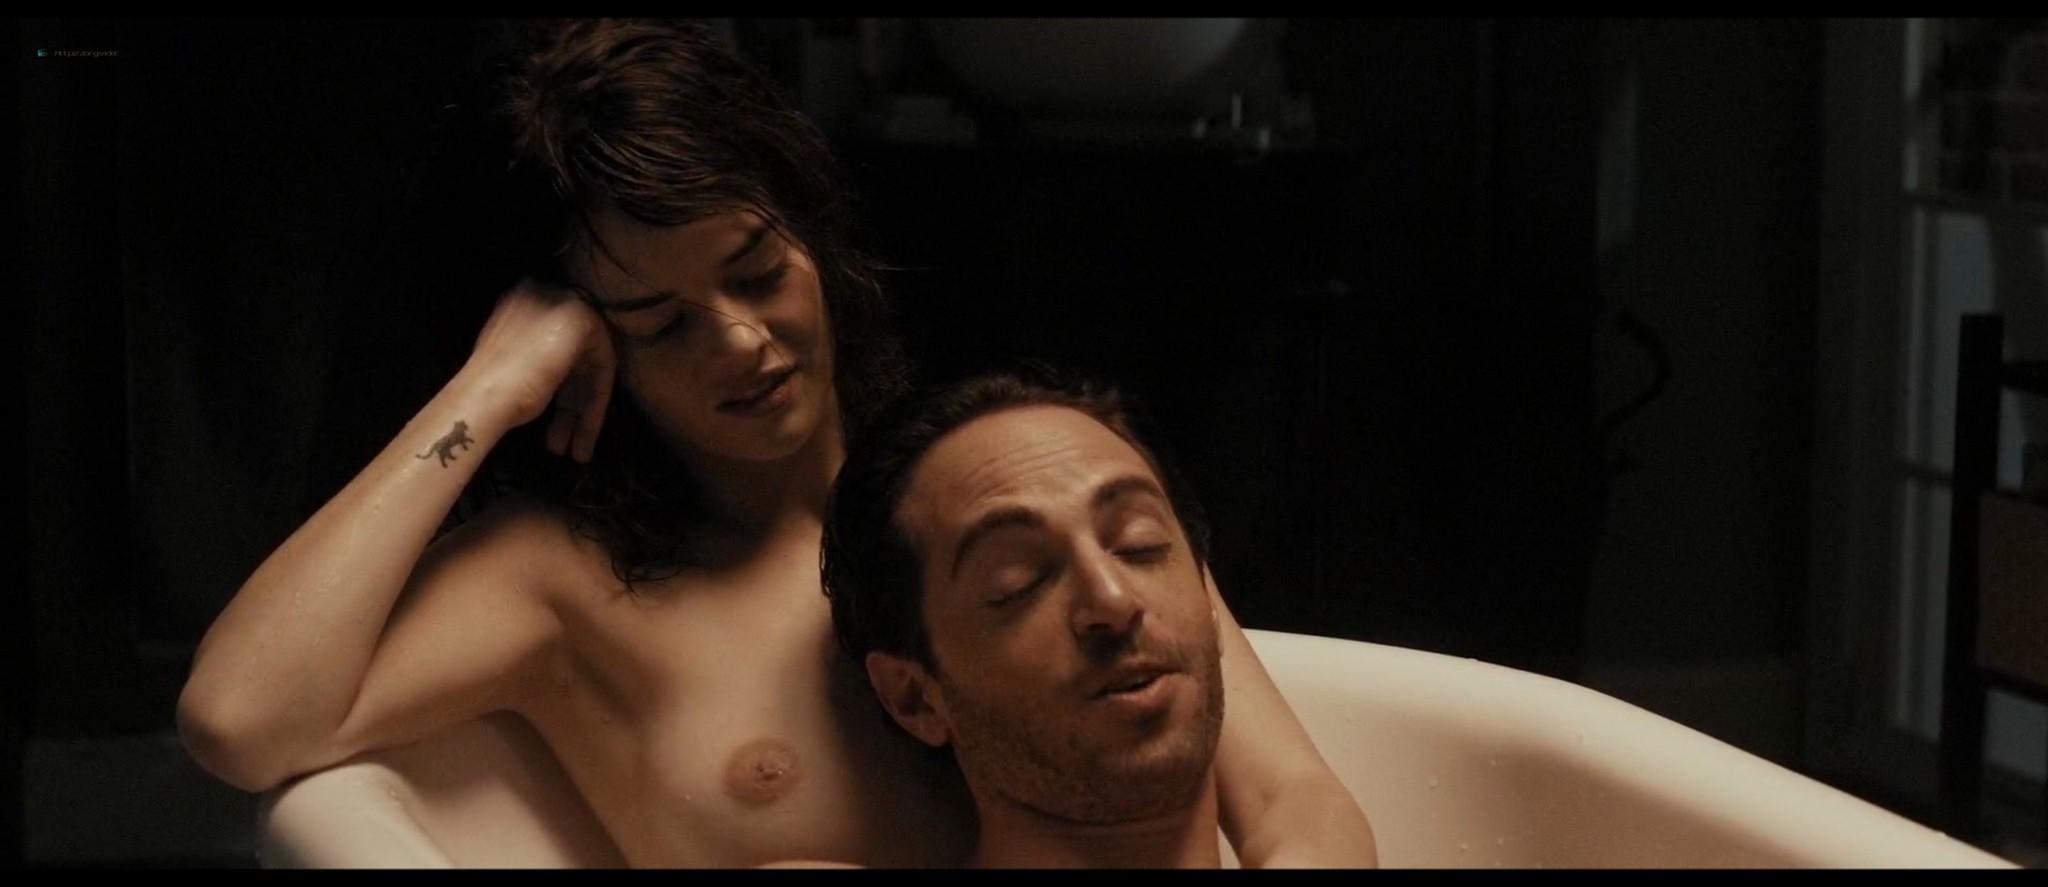 Samara Weaving nude butt and boobs Carly Chaikin sexy - Last Moment of Clarity (2020) HD 1080p (14)